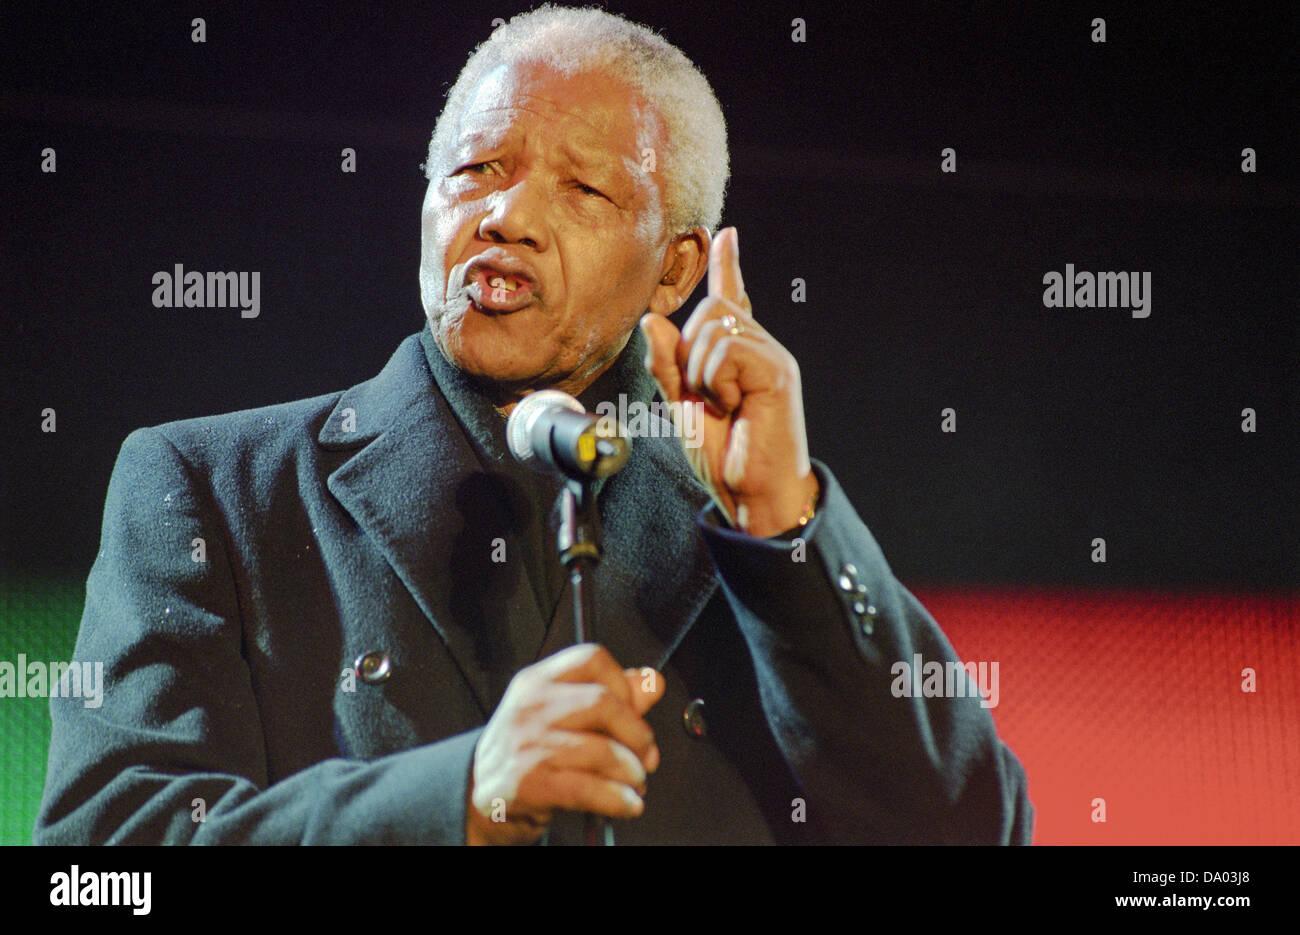 Nelson Mandela at the Celebrate South Africa concert in Trafalgar Square, London, UK. - Stock Image